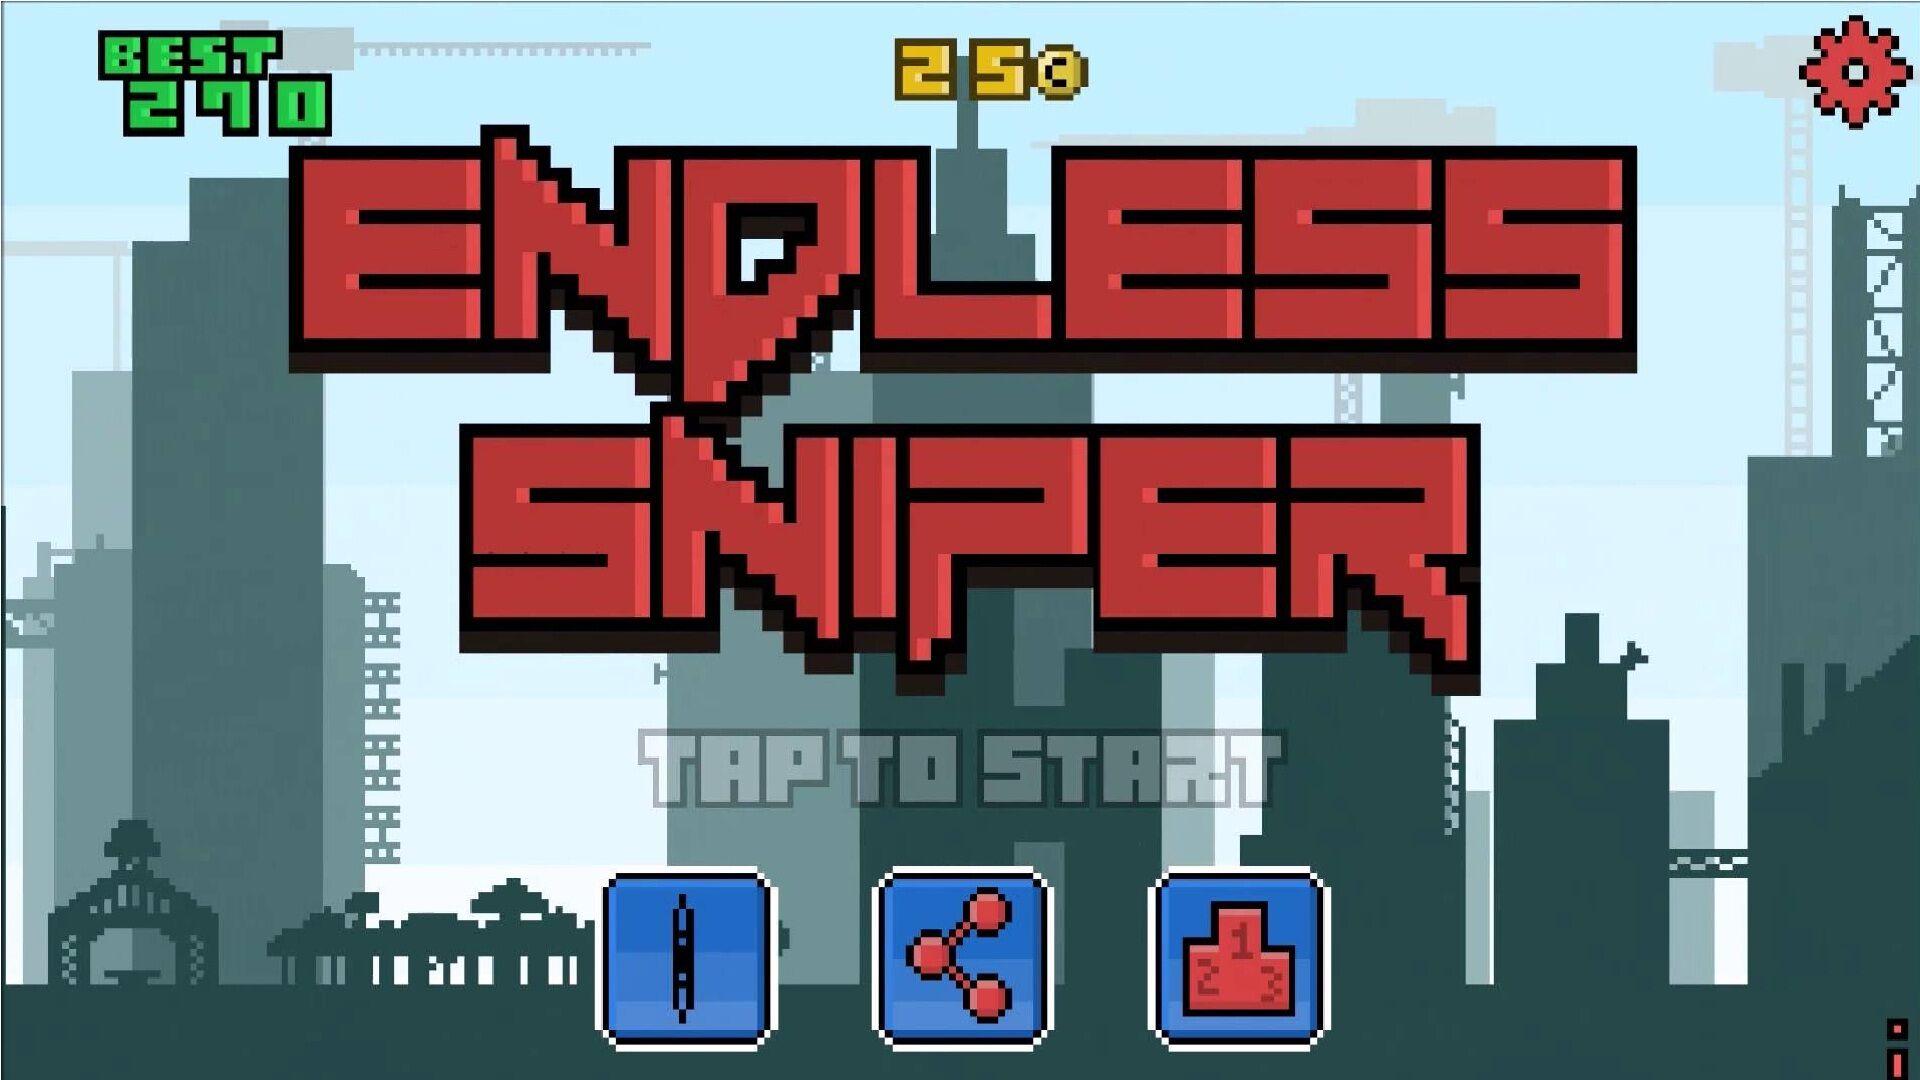 EndlessSniper